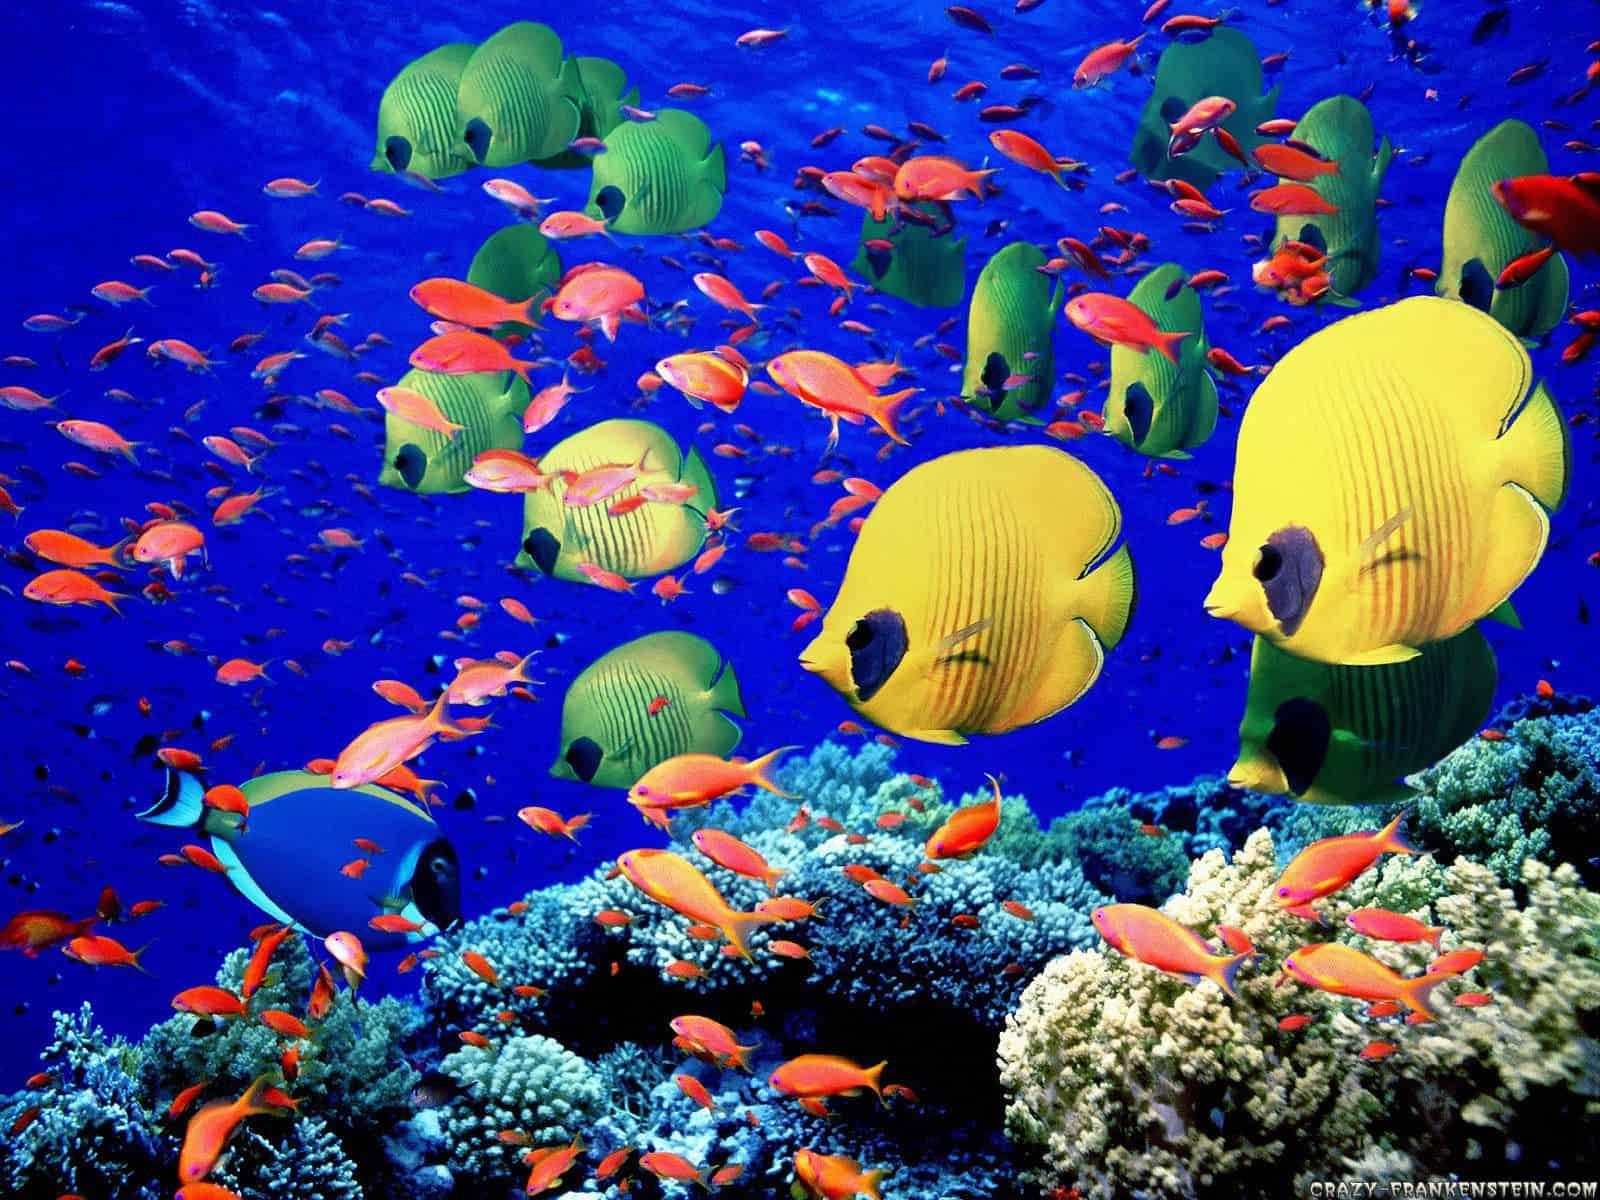 New Study Estimates 1 Million Marine Species